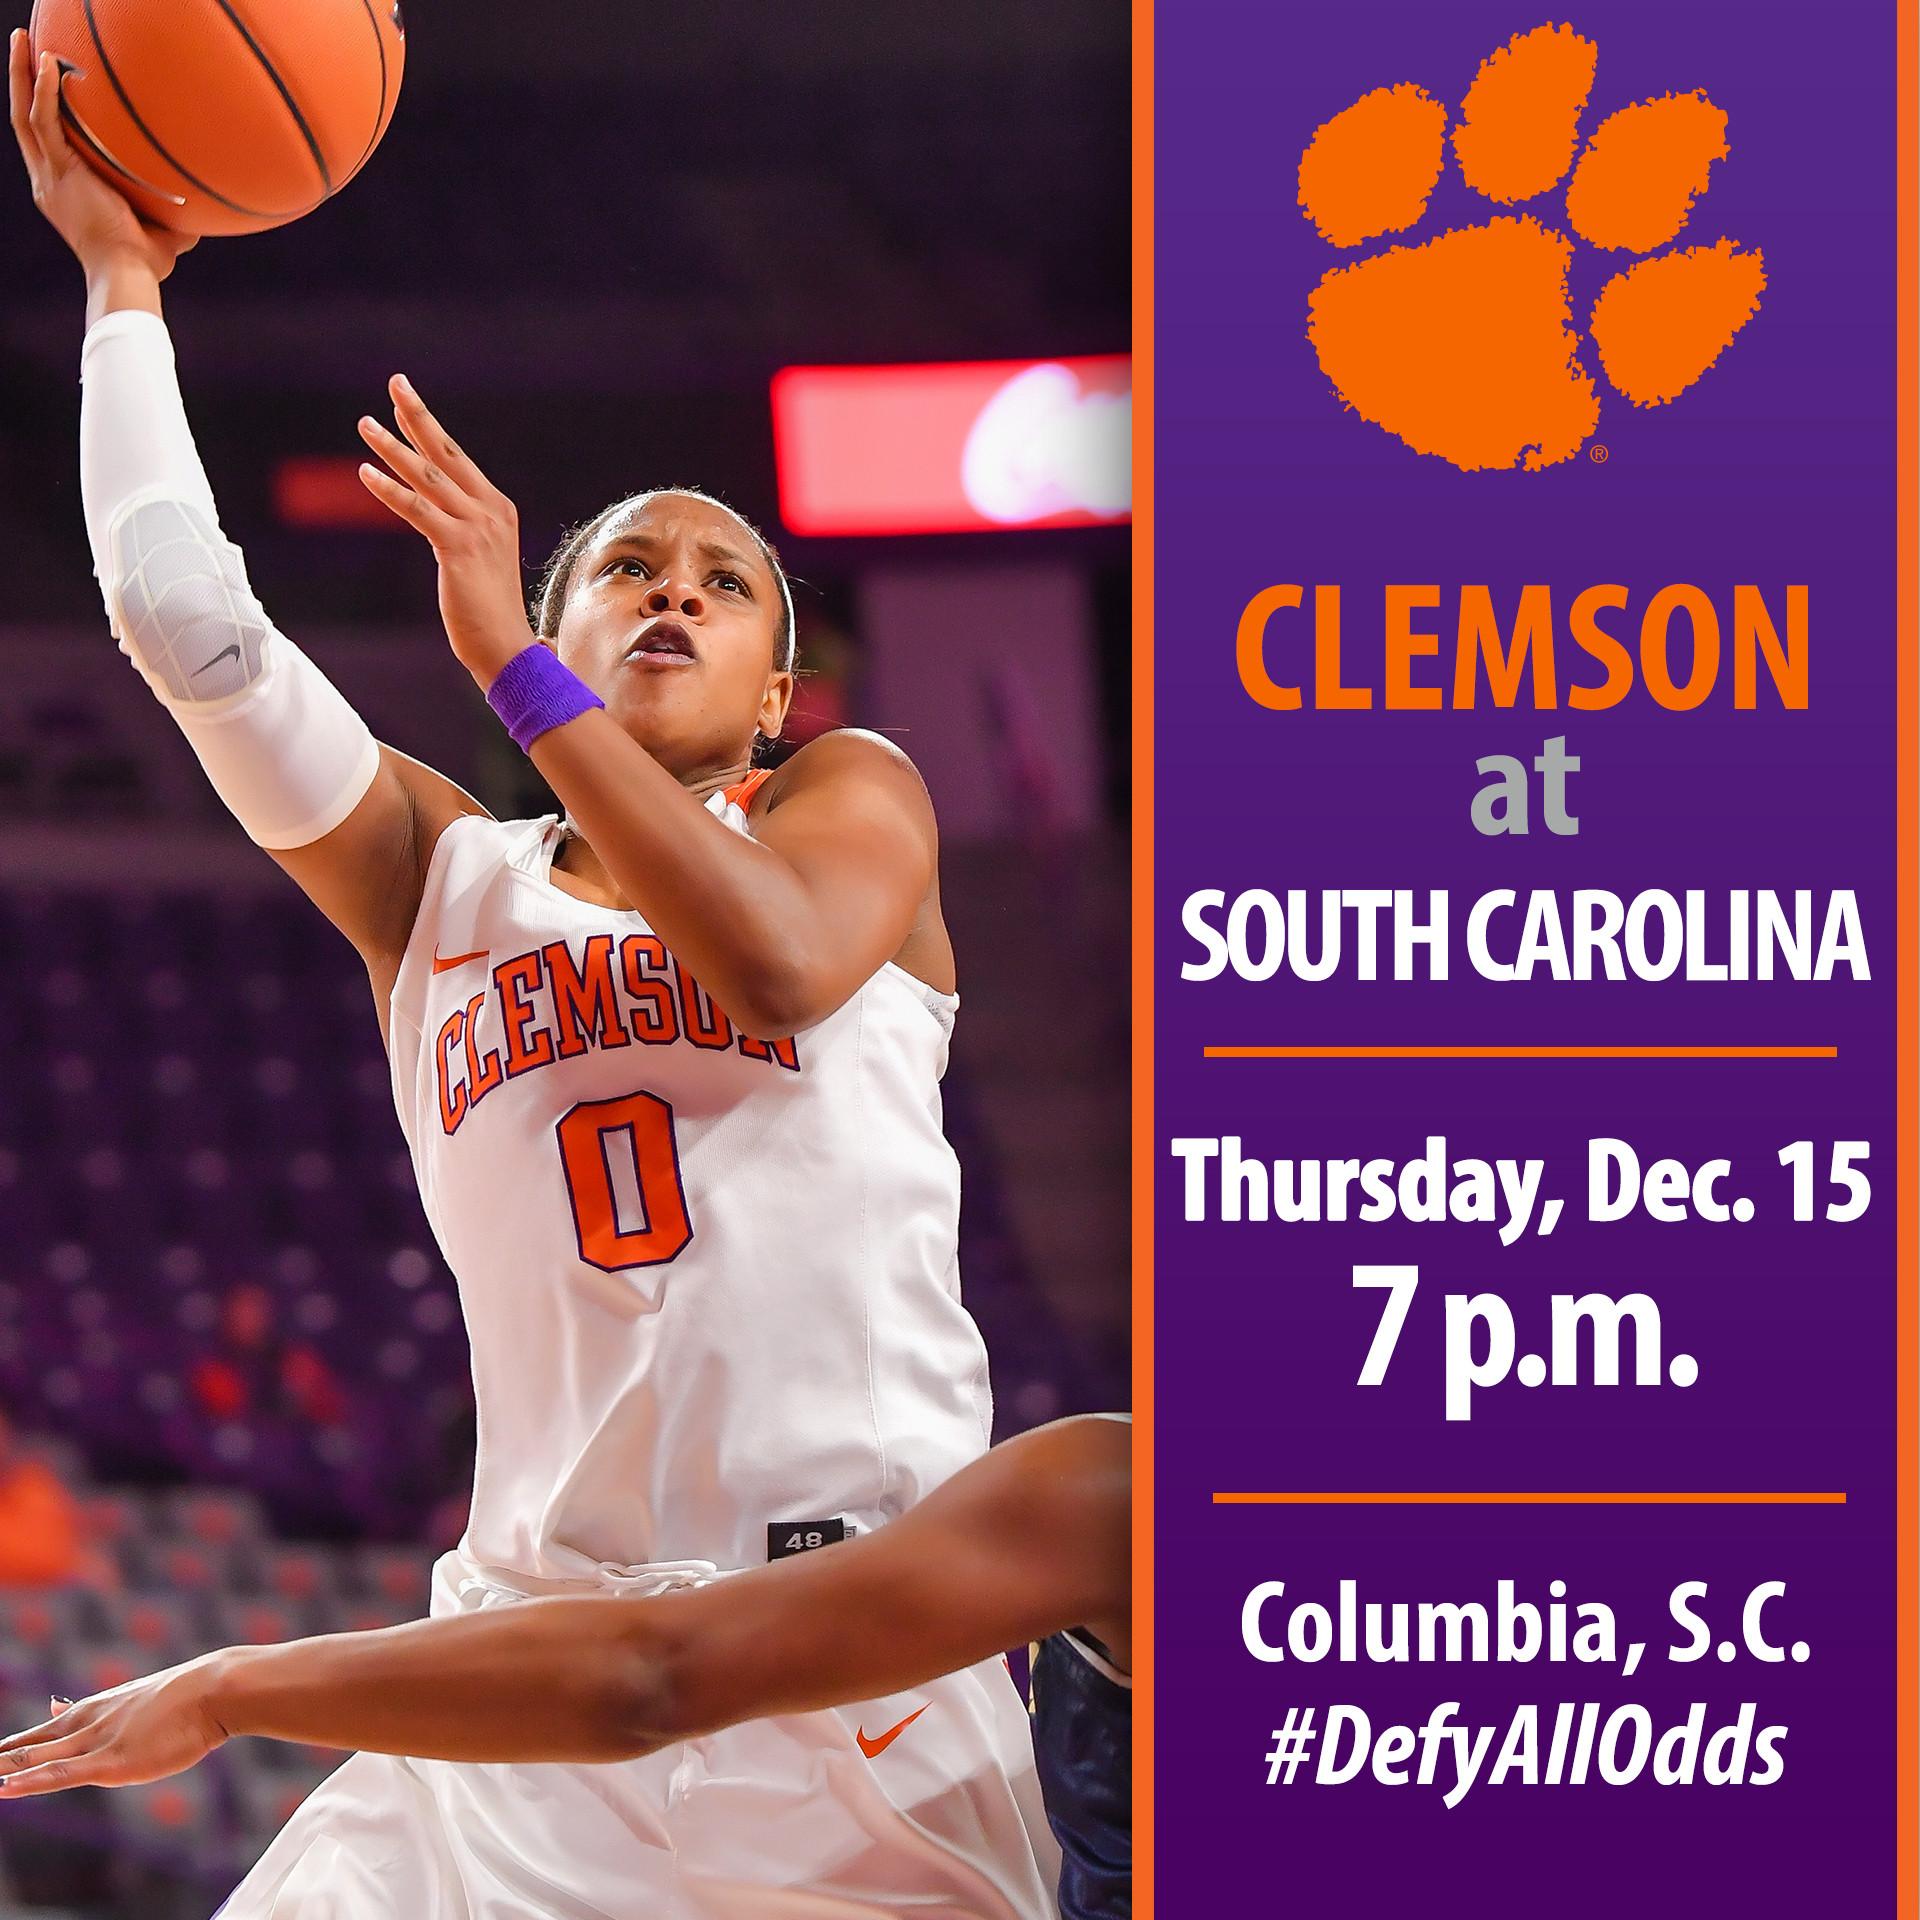 Clemson Travels to Columbia to Face No. 6/6 South Carolina Thursday